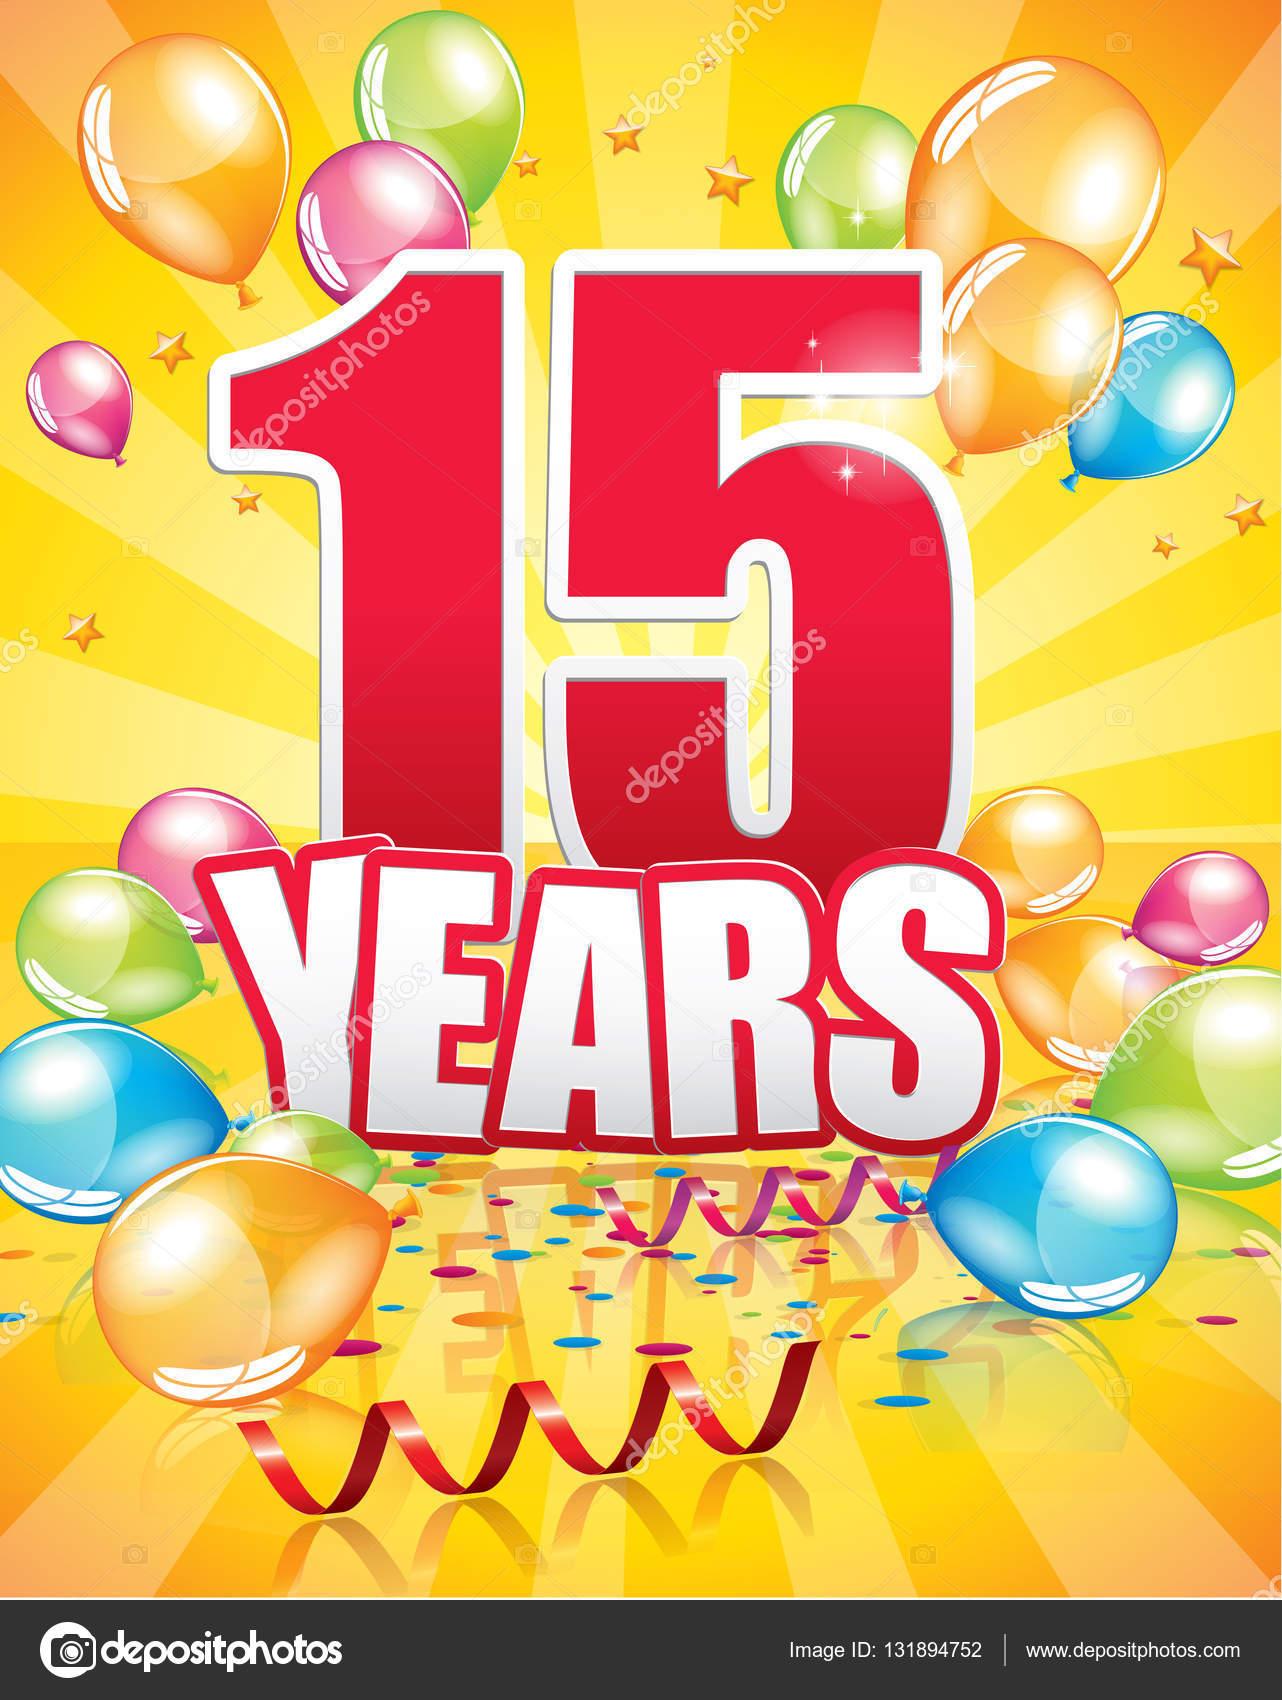 födelsedagskort 15 år 15 år födelsedagskort — Stock Vektor © Orkidia #131894752 födelsedagskort 15 år